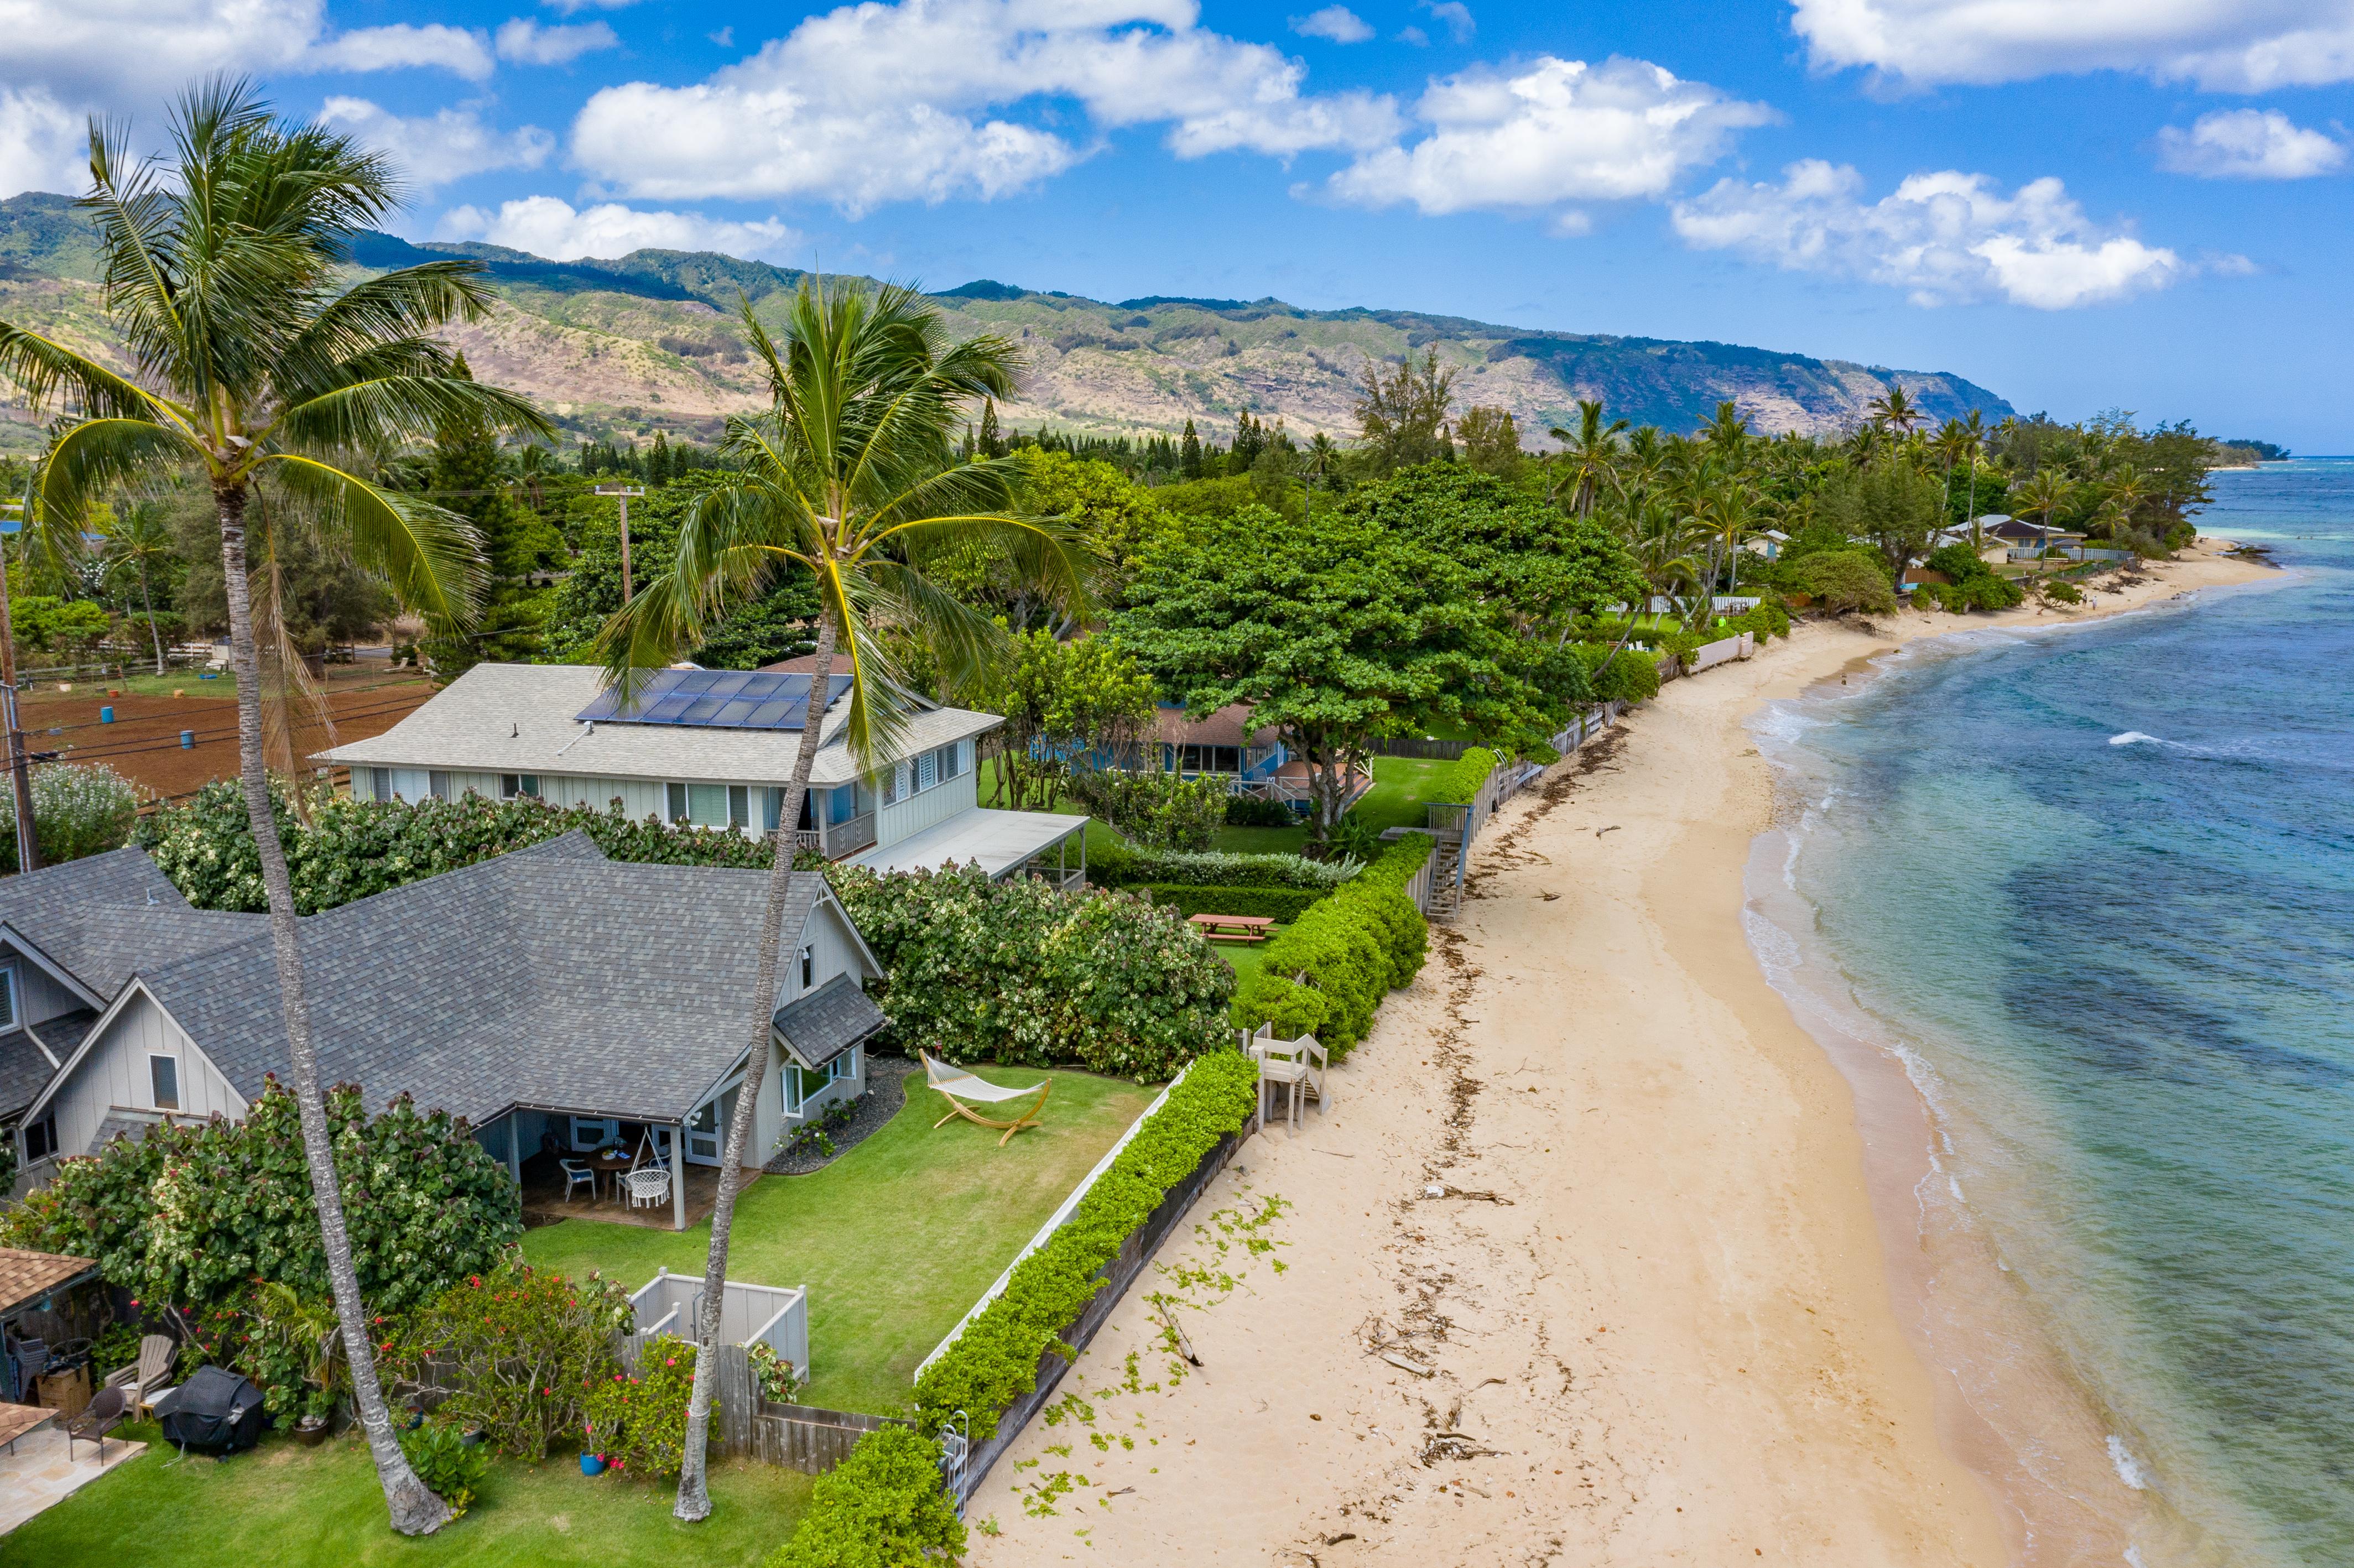 Hawaii Vacation Rental Home, Oahu Outdoor Shower Rentals